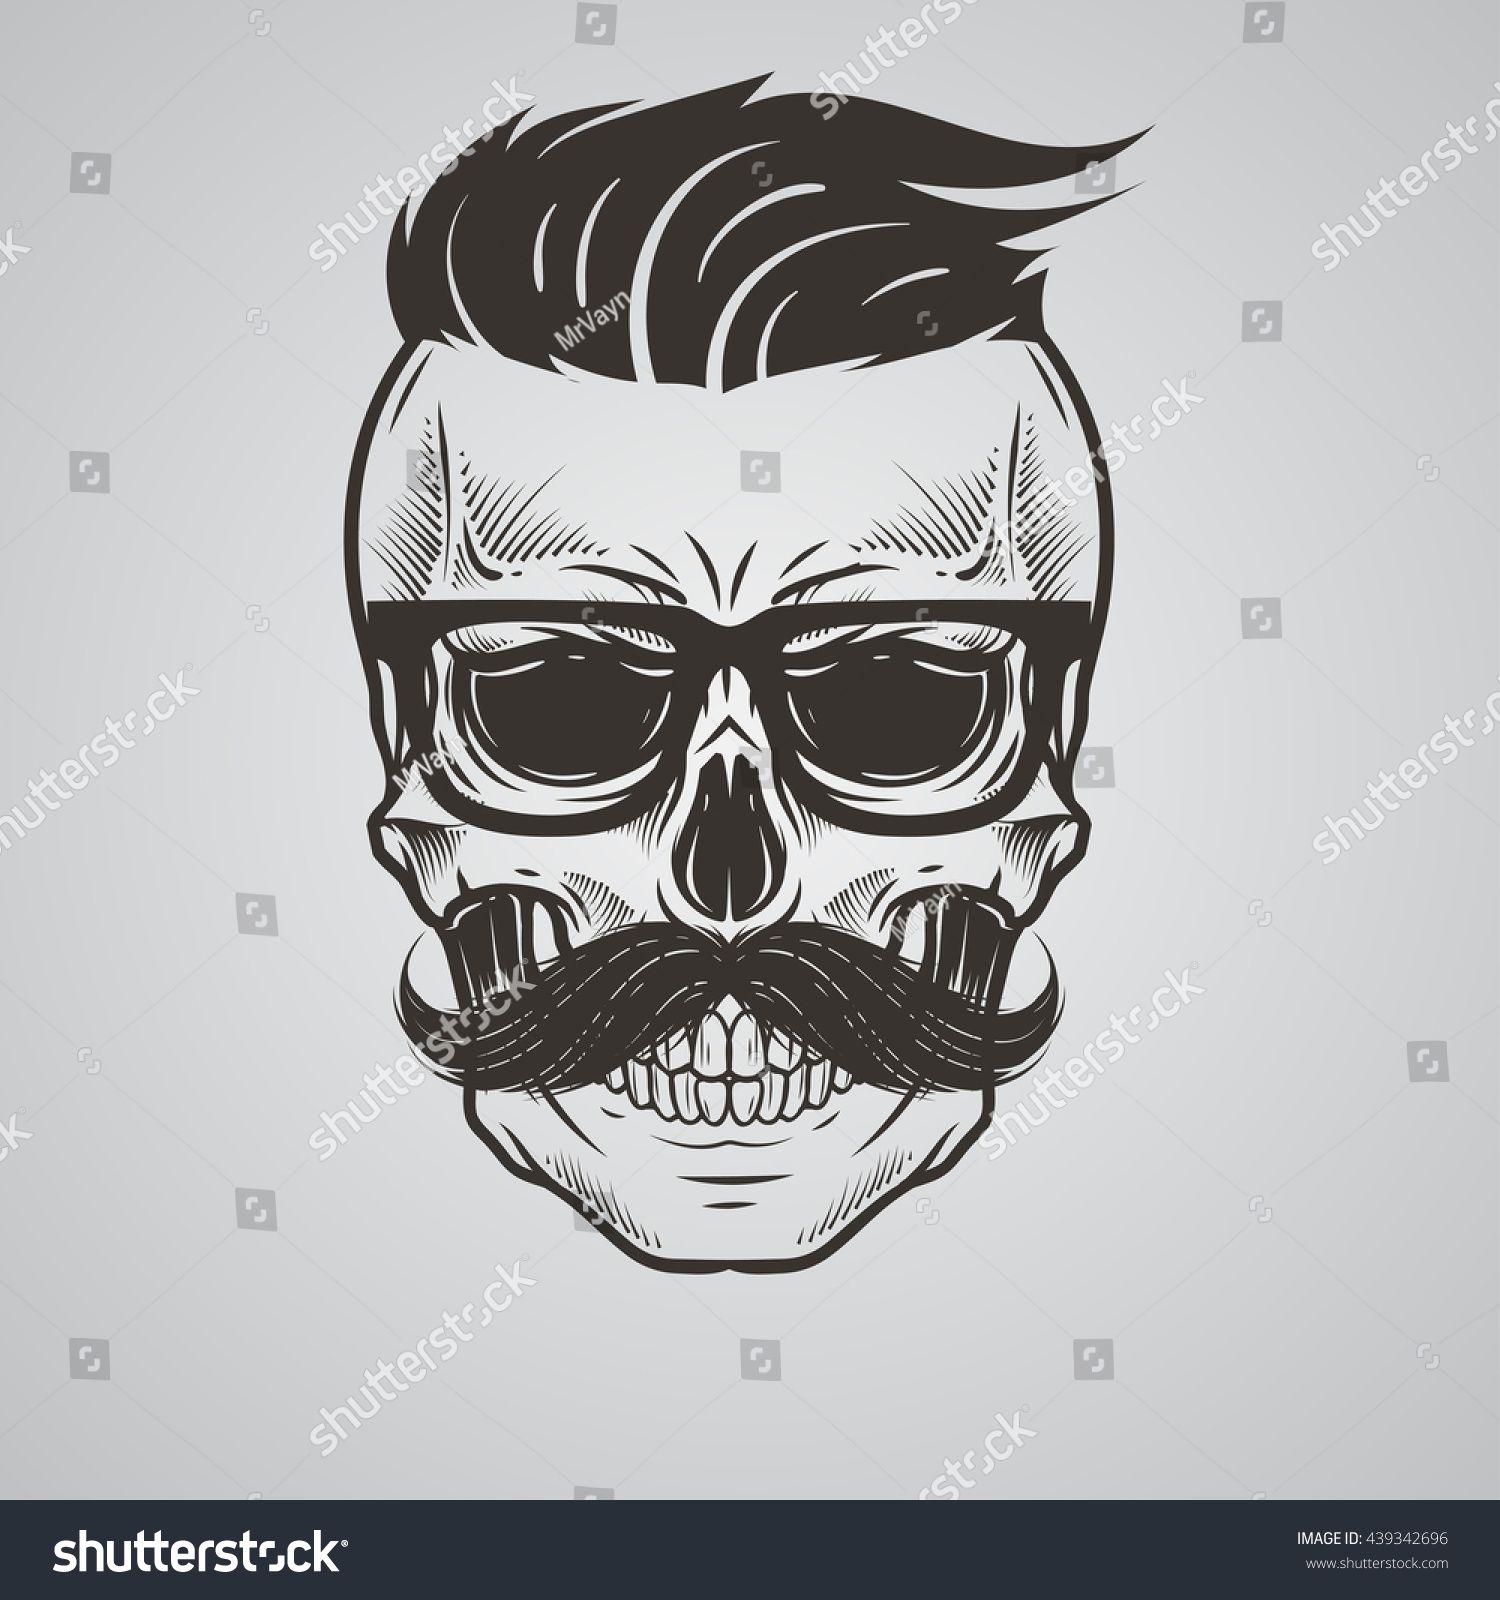 Bearded Skull Illustration Schedel Ontwerp Tatoeage Studio